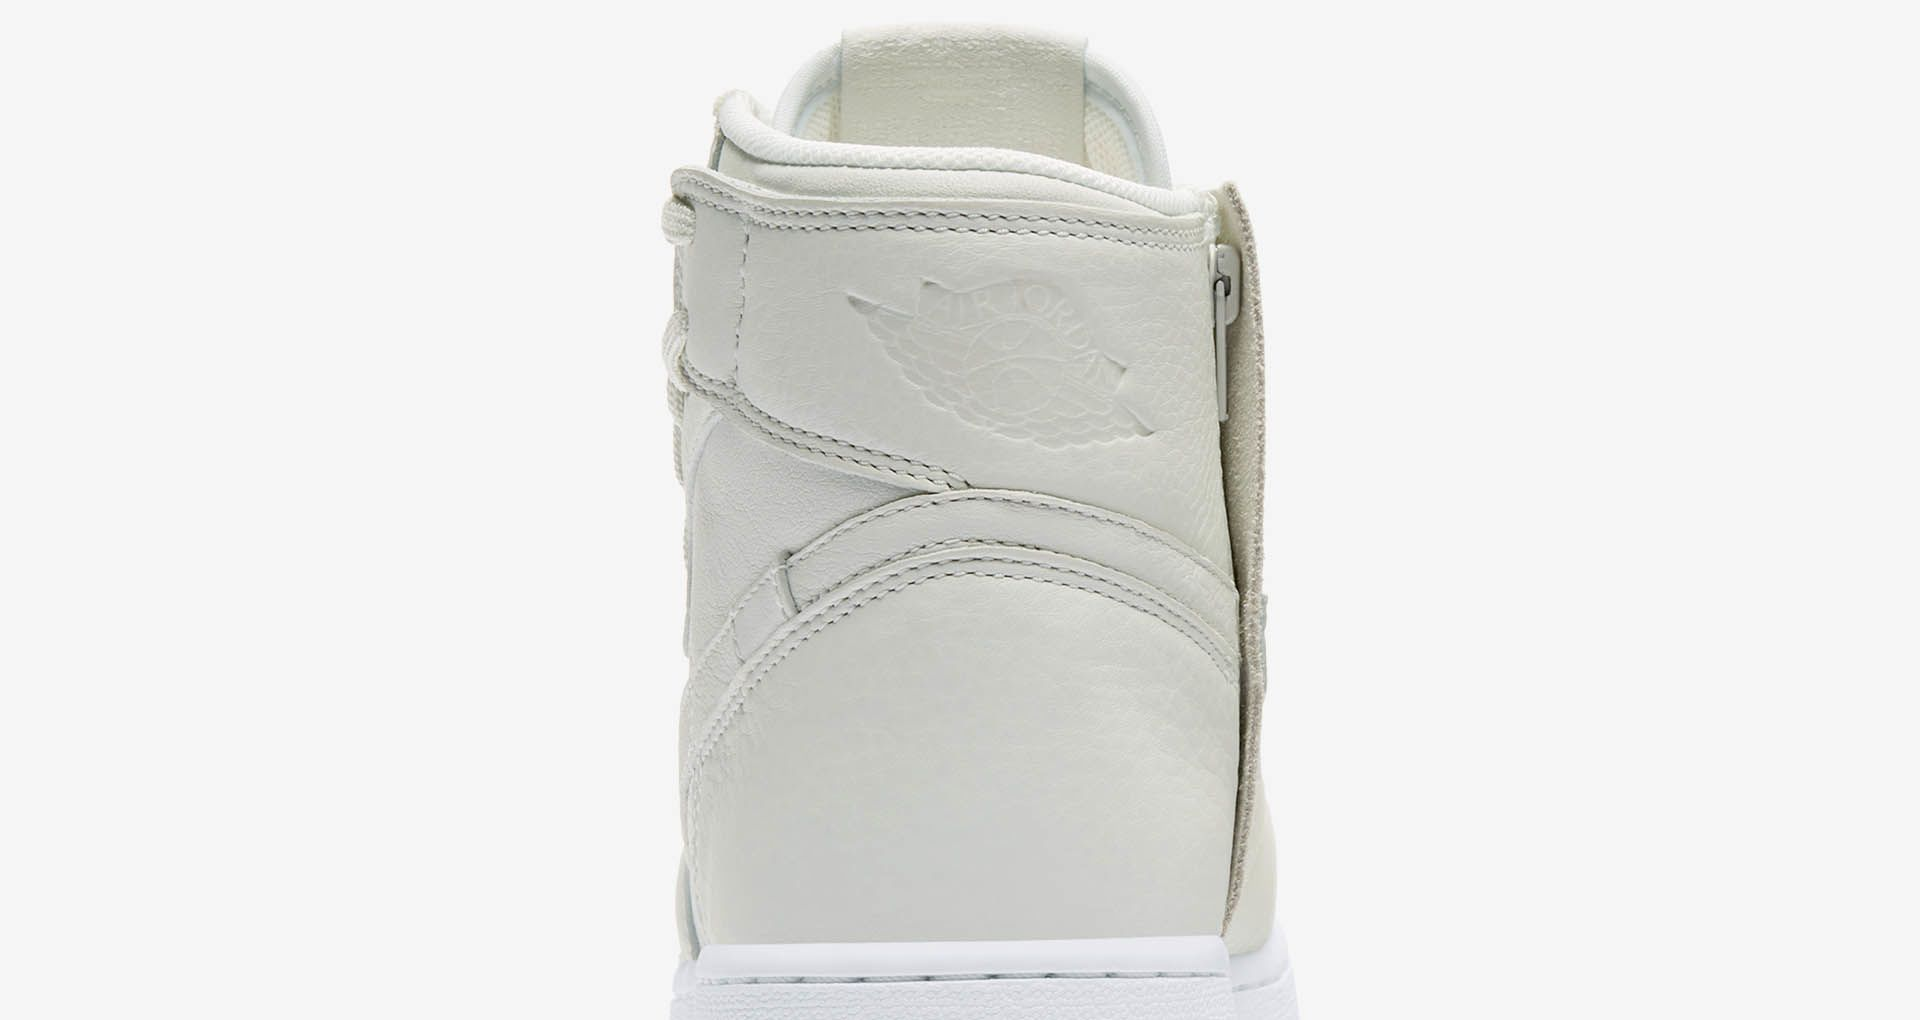 Women s Air Jordan 1 Rebel XX  1 Reimagined  Release Date. Nike+ SNKRS 9869fc77e